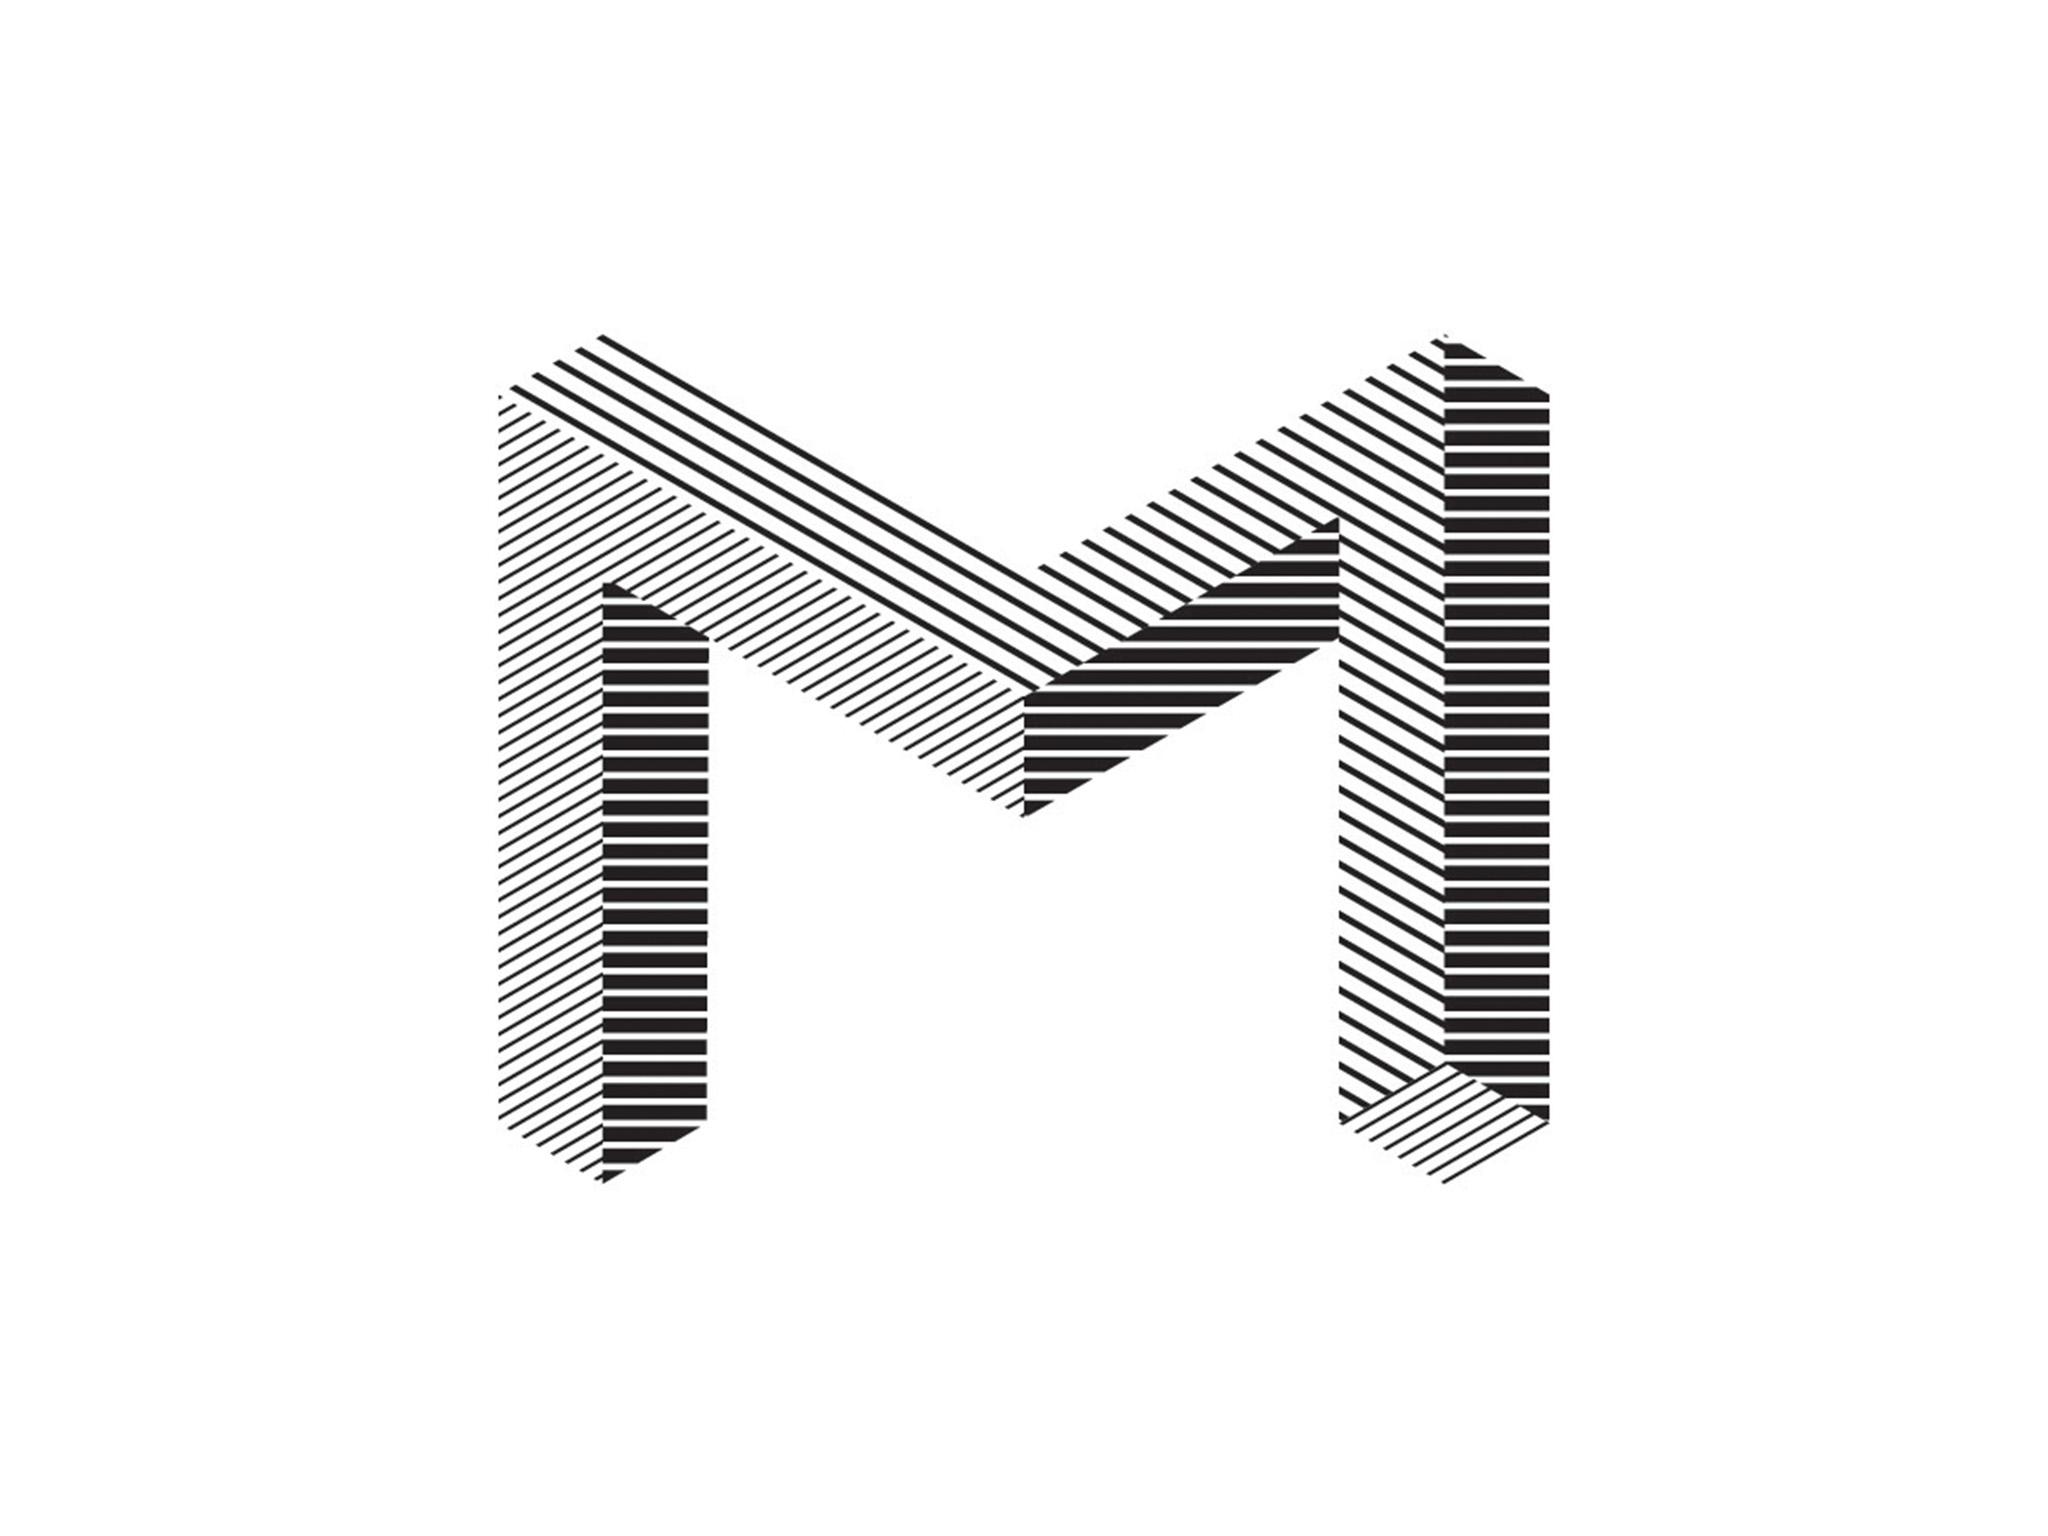 apex_letters_horizontal_large_0027_2_final_alphabet coasters-13.jpg